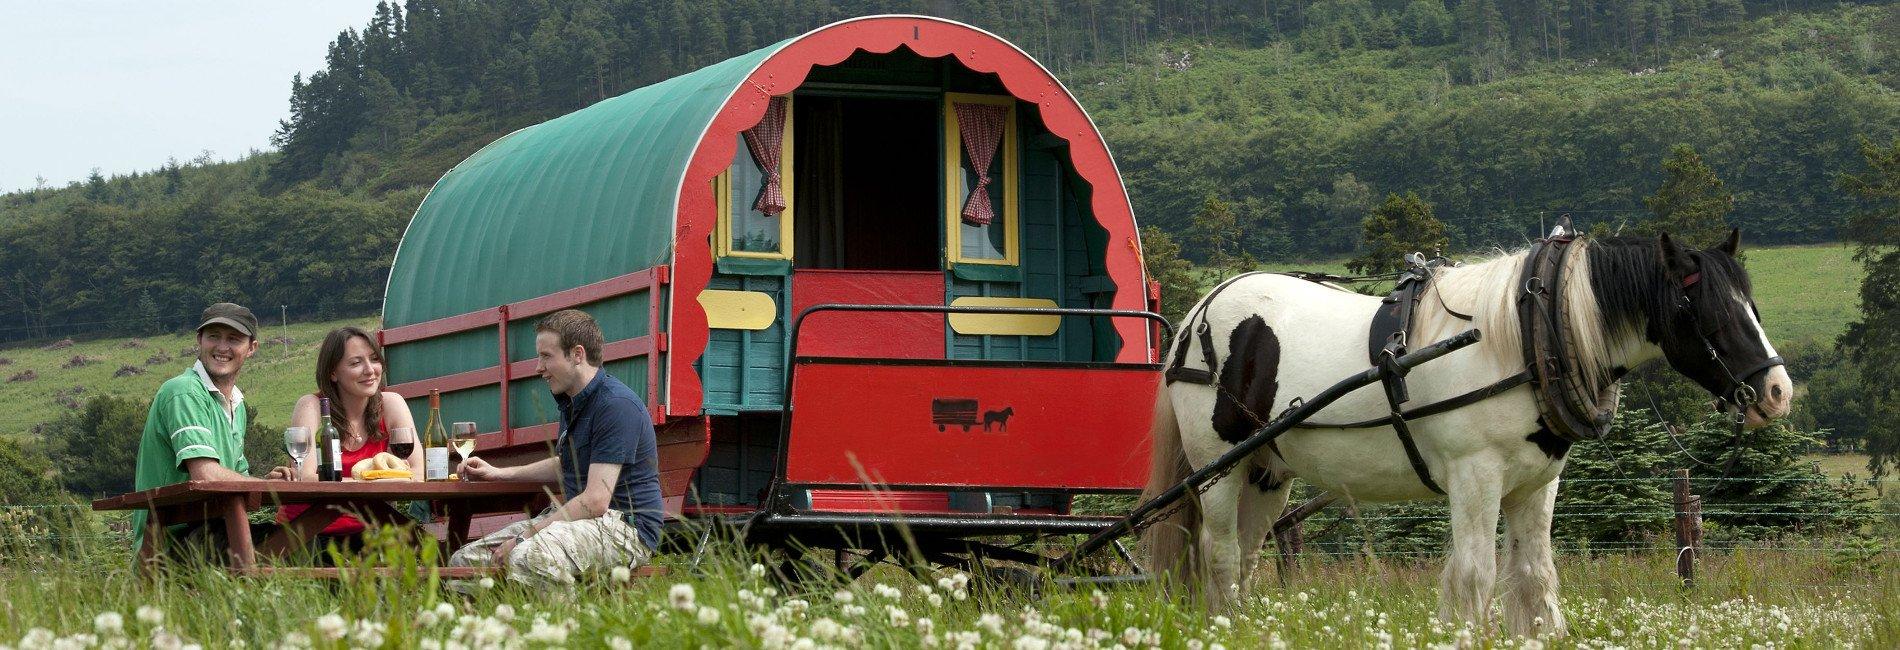 Clissmann-Horse-Caravans-slider-650-1